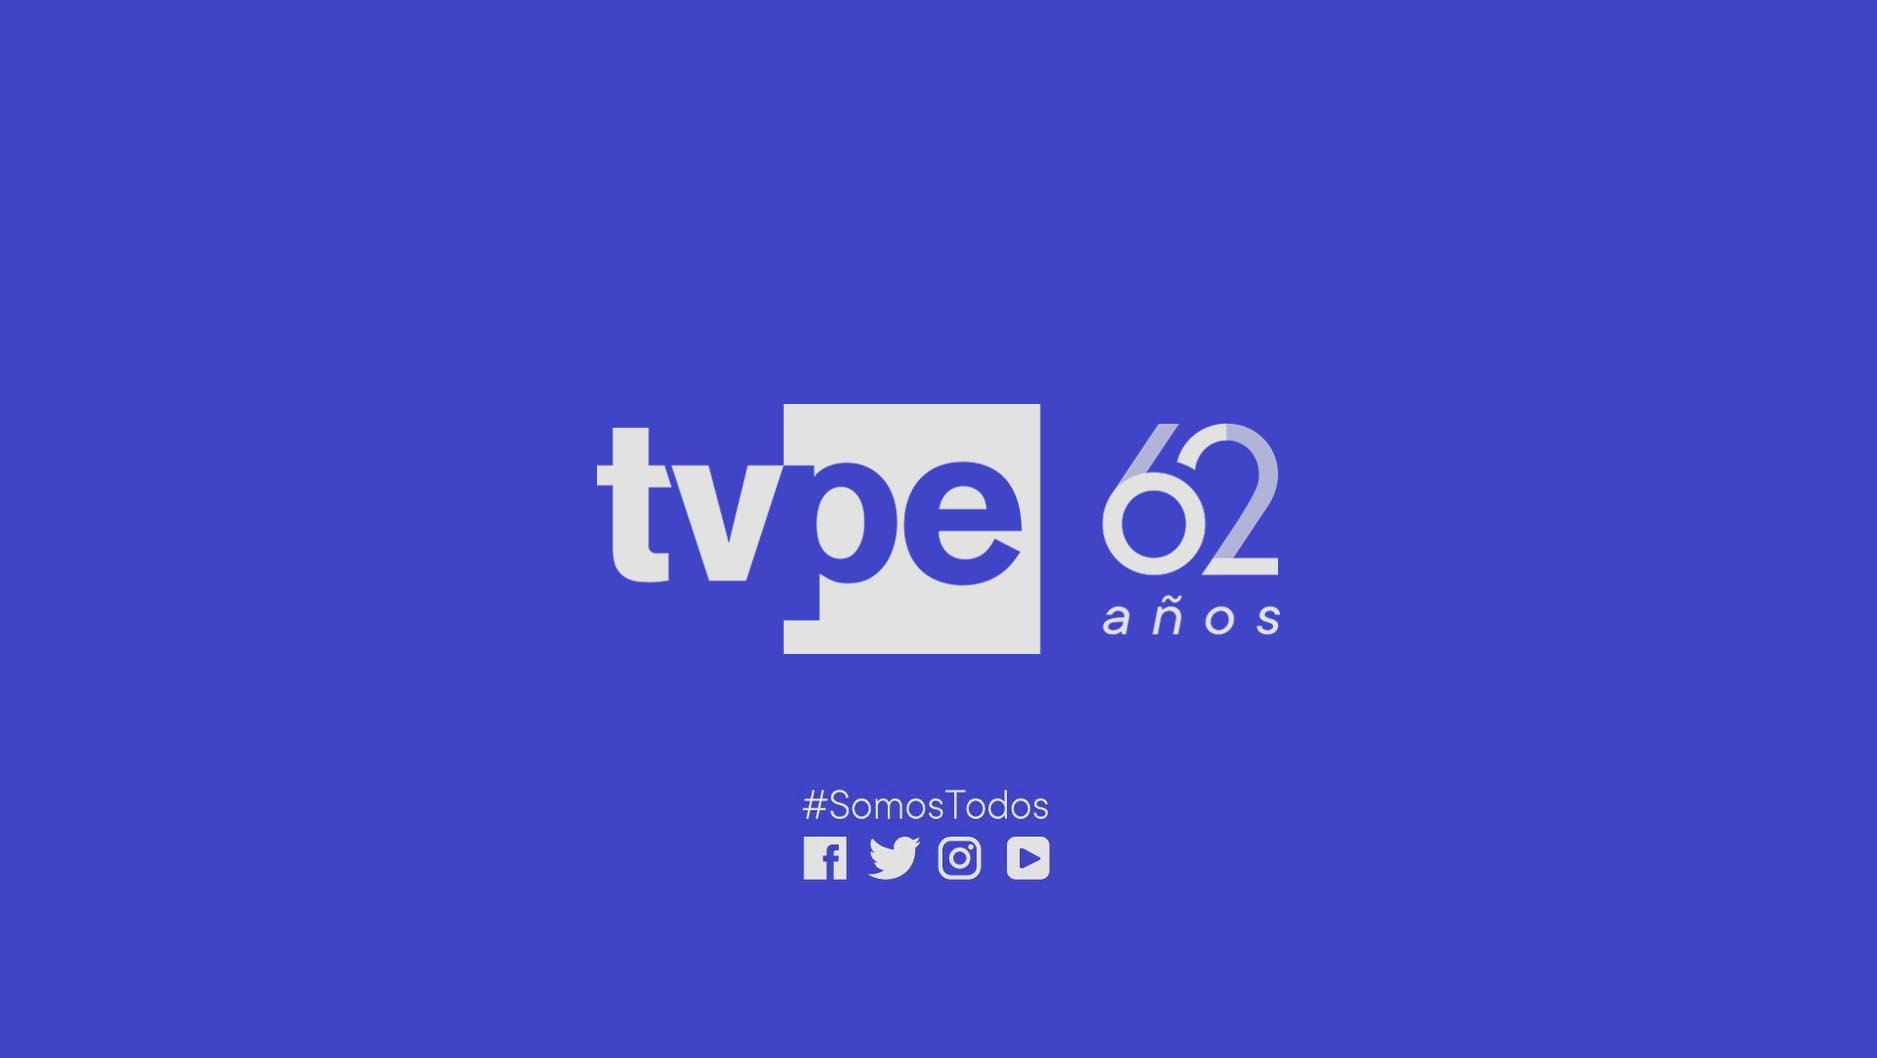 tvpe62.jpg